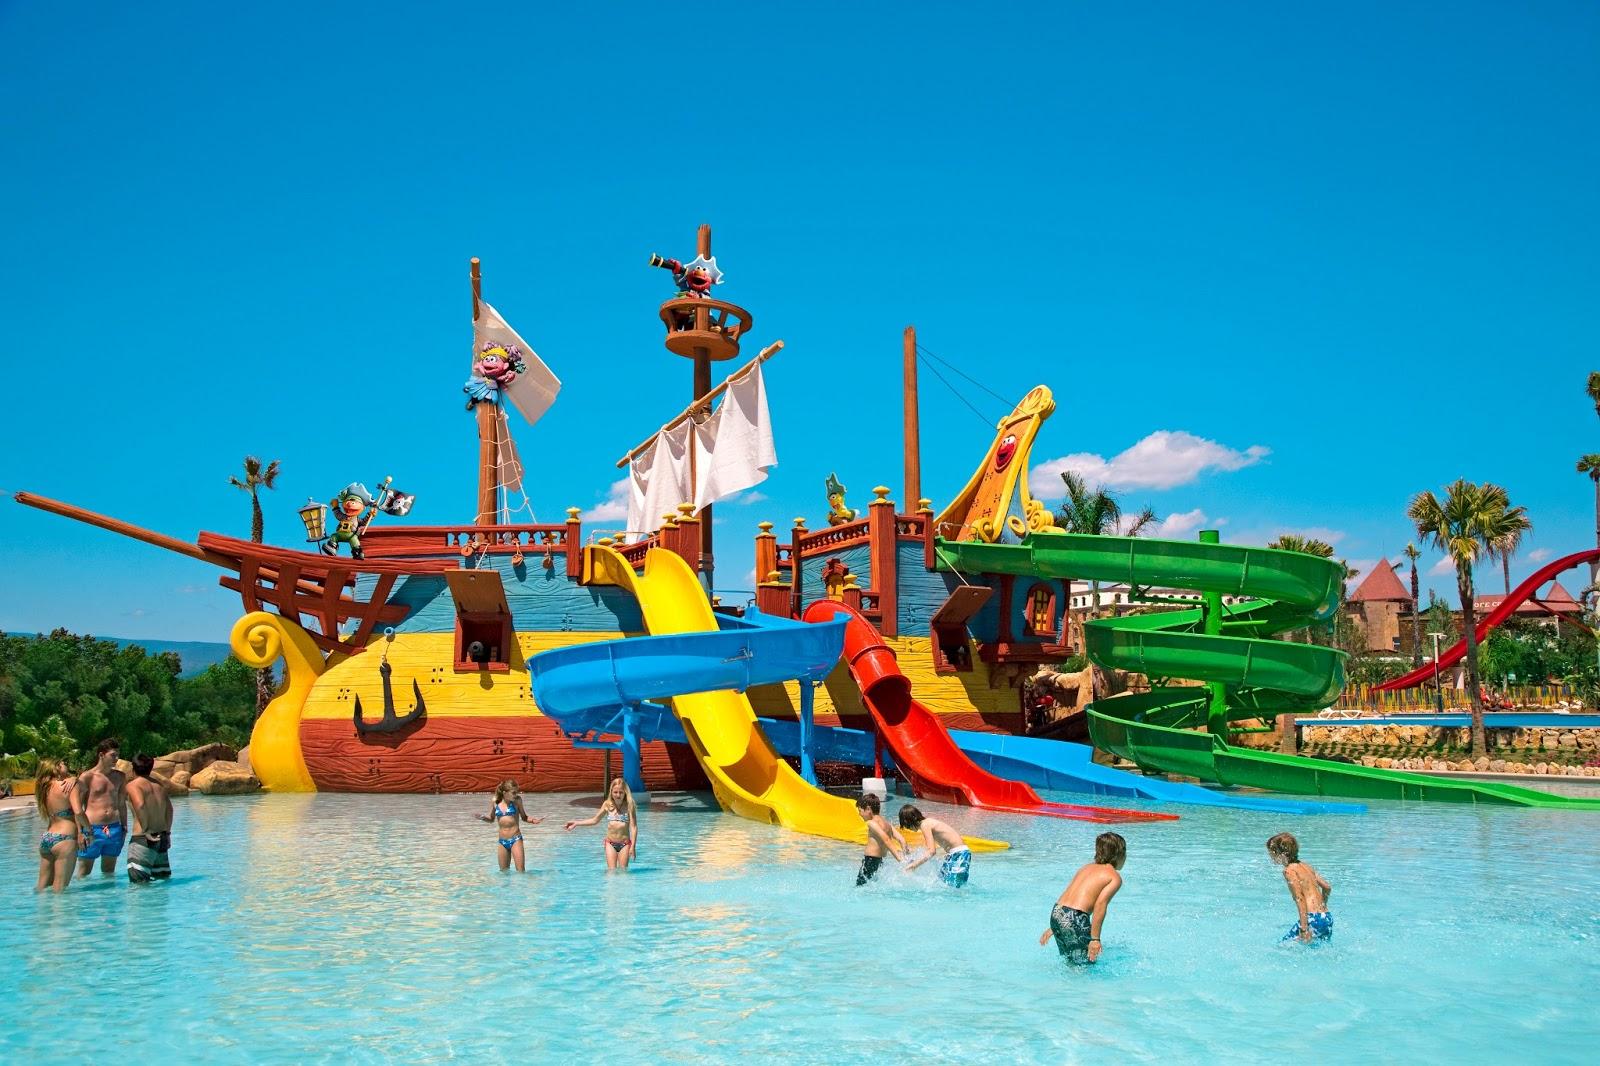 alentours barcelone portaventura costa caribe aquatic park